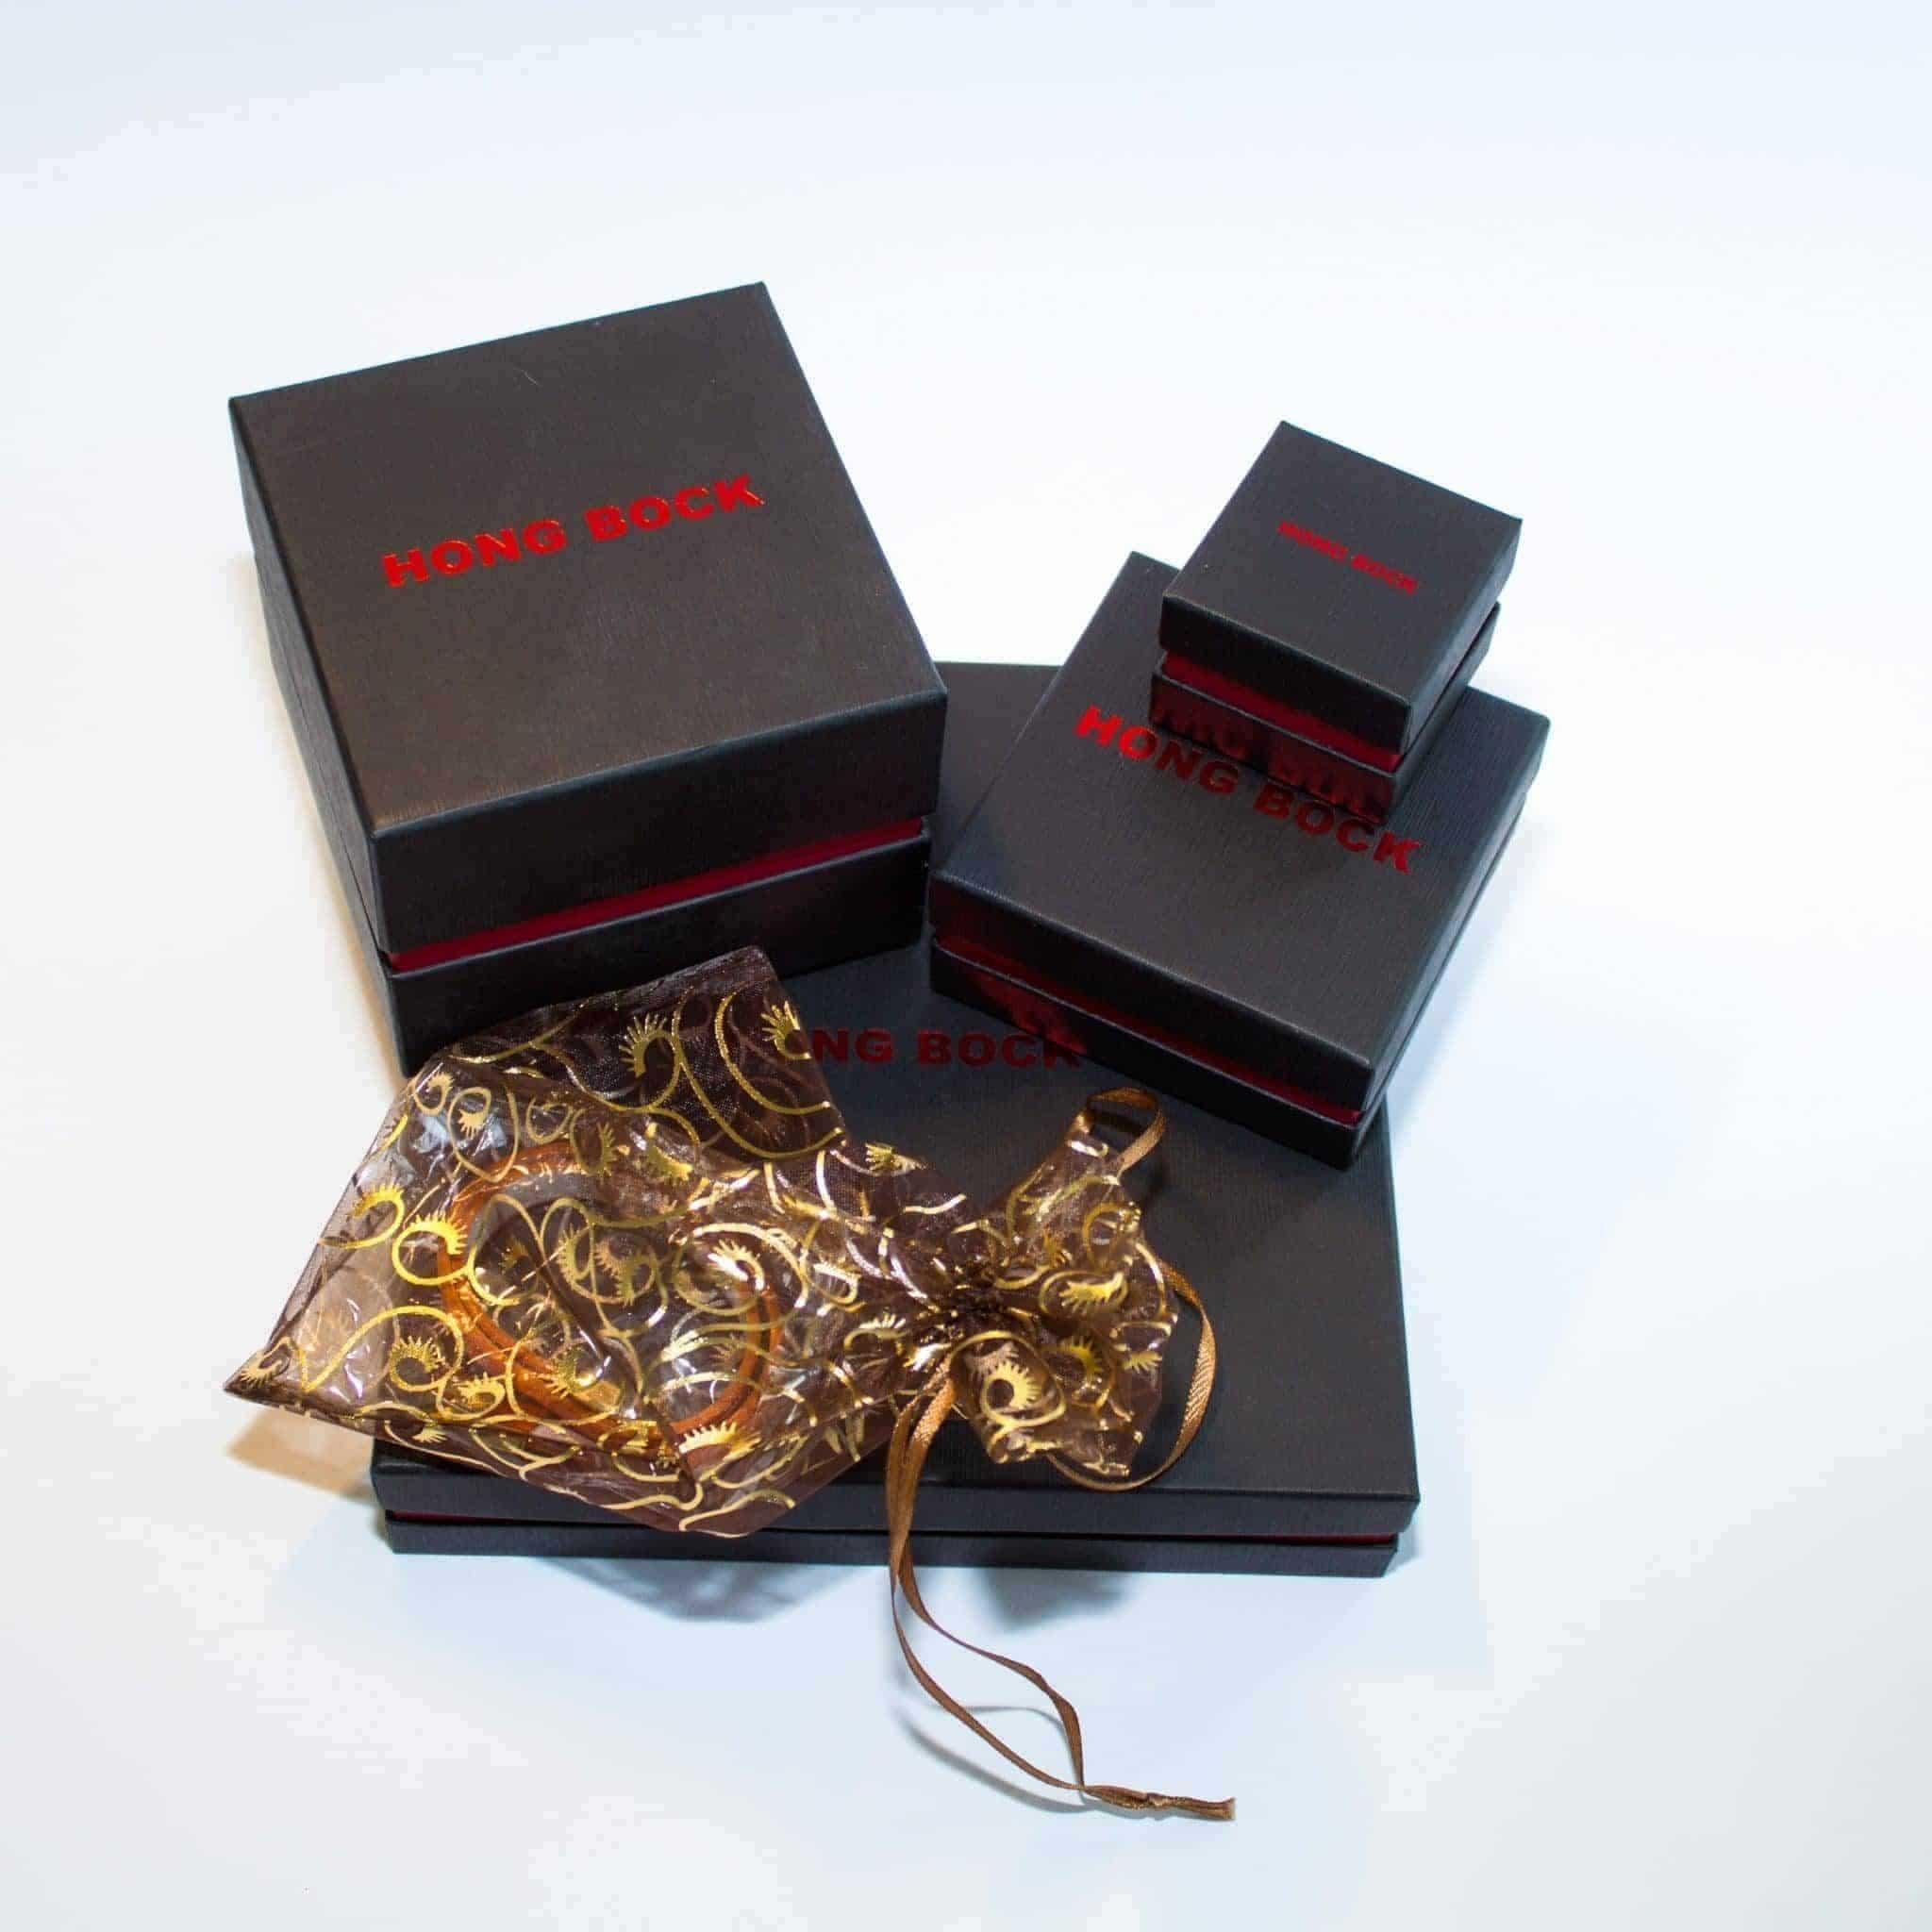 HONG BOCK-Design - Ohrhänger mit Schaumkorallen-Rosen an Silberhaken-2196